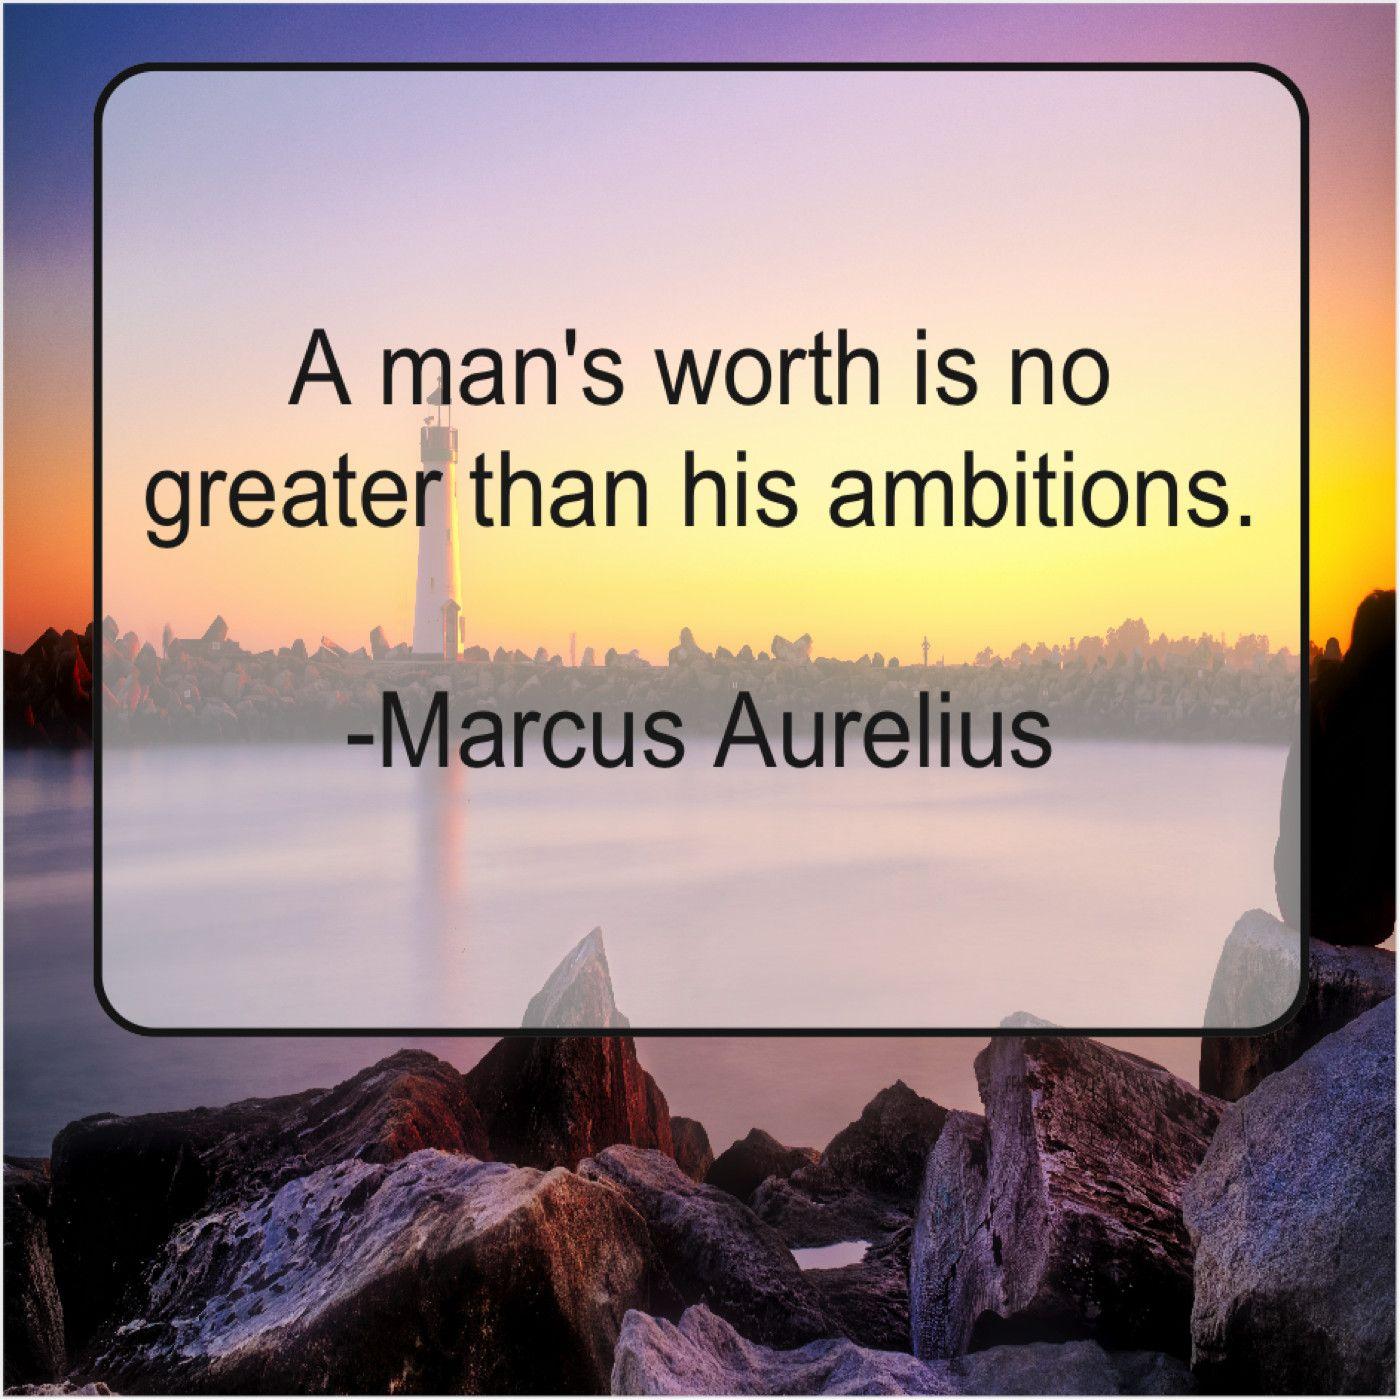 Marcus Aurelius A mans worth is no Flavor flav, Secret